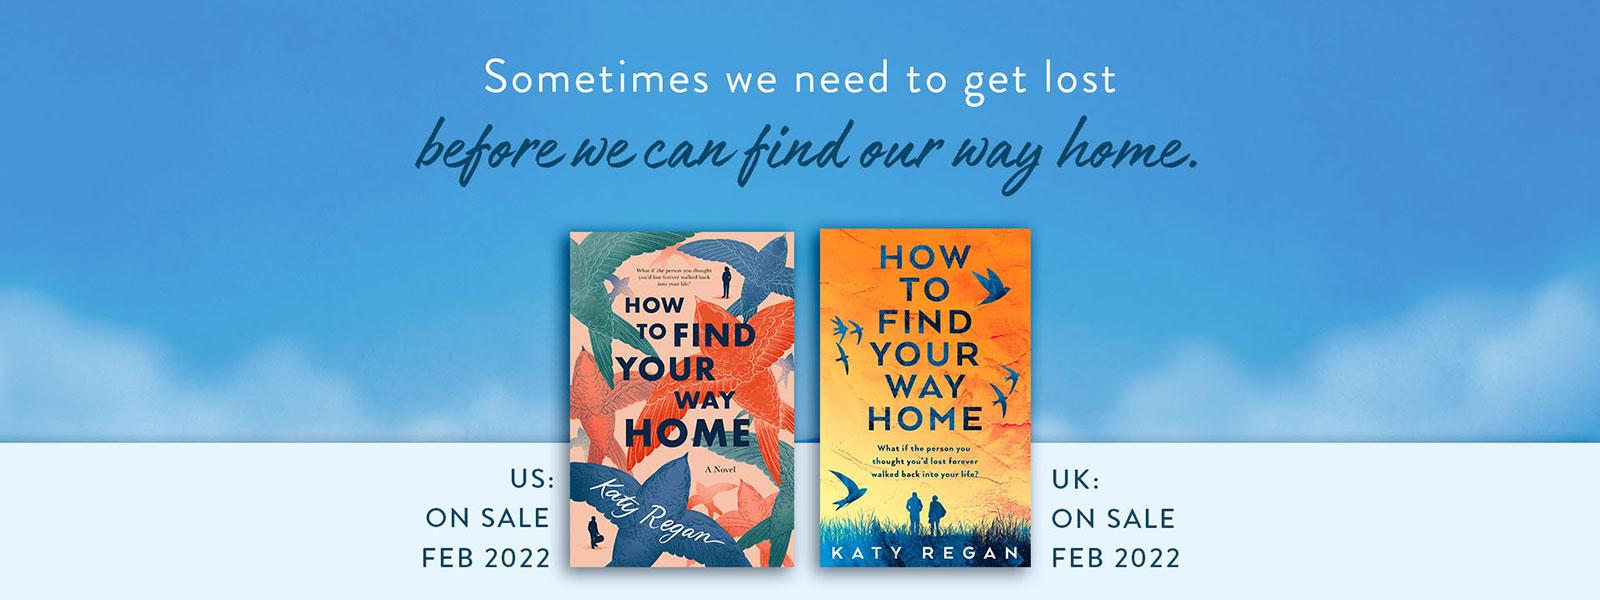 How to find your way home - Katy Regan